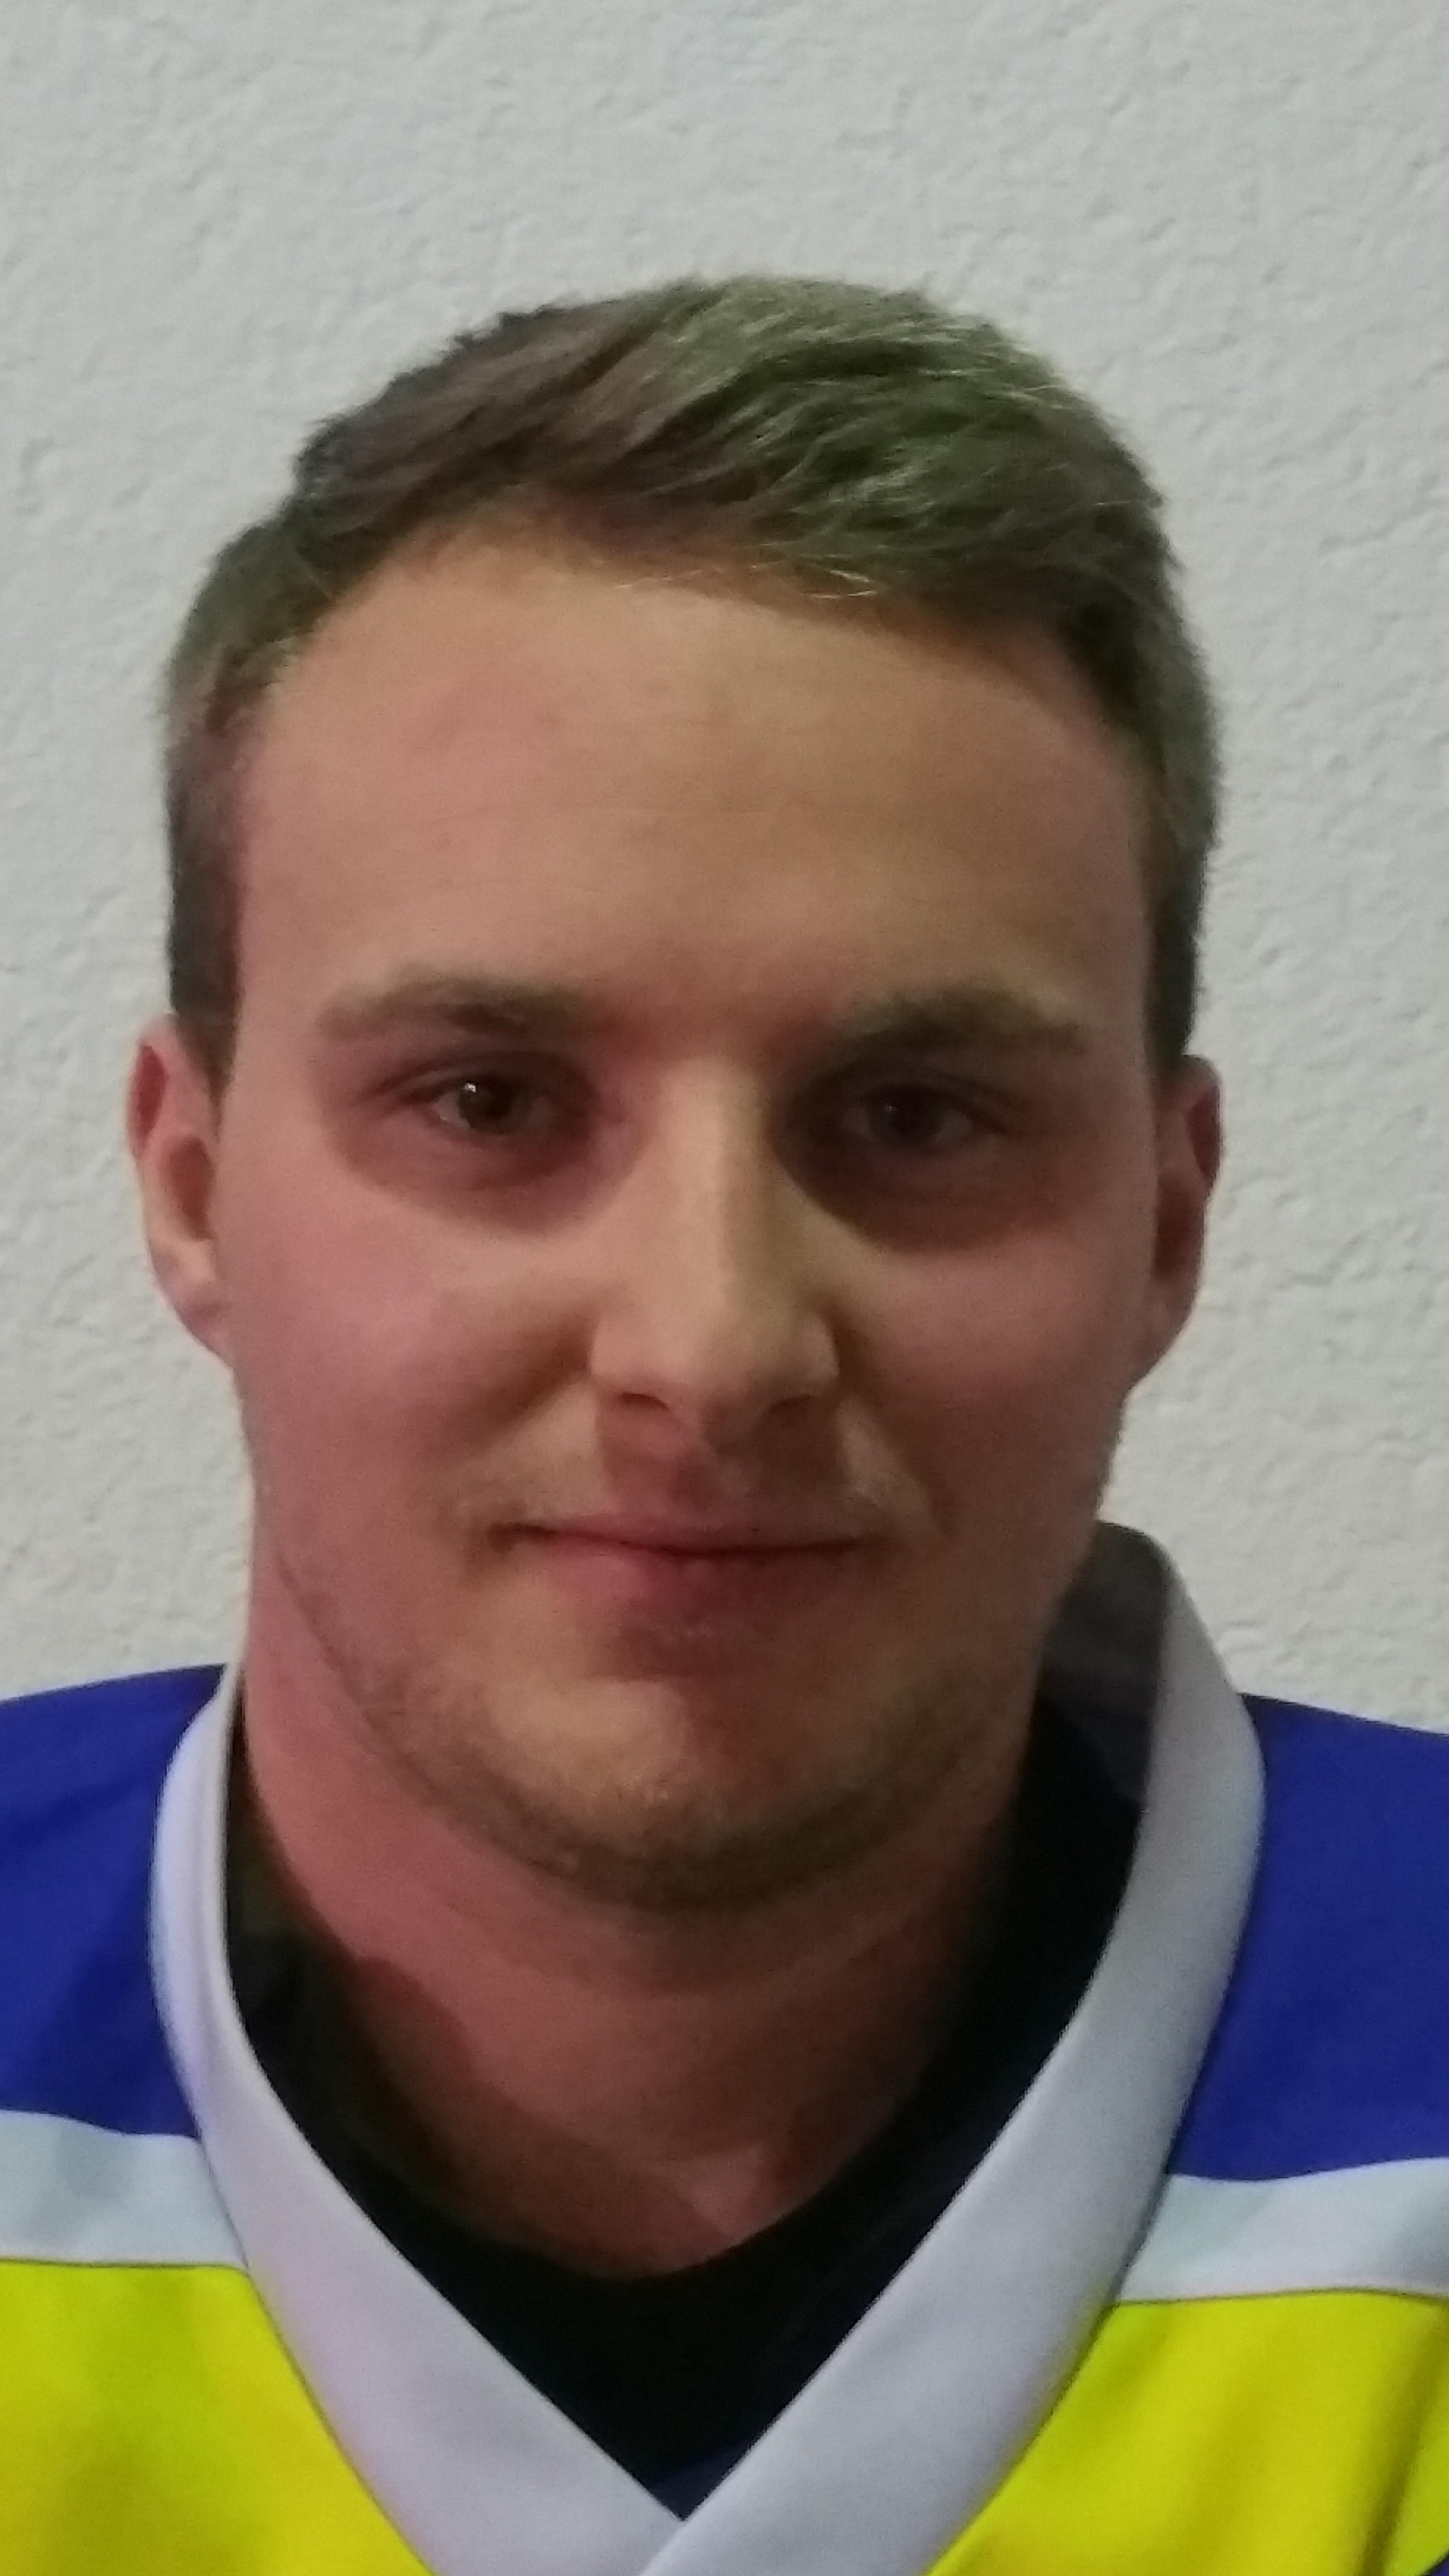 Stefan Detterbeck